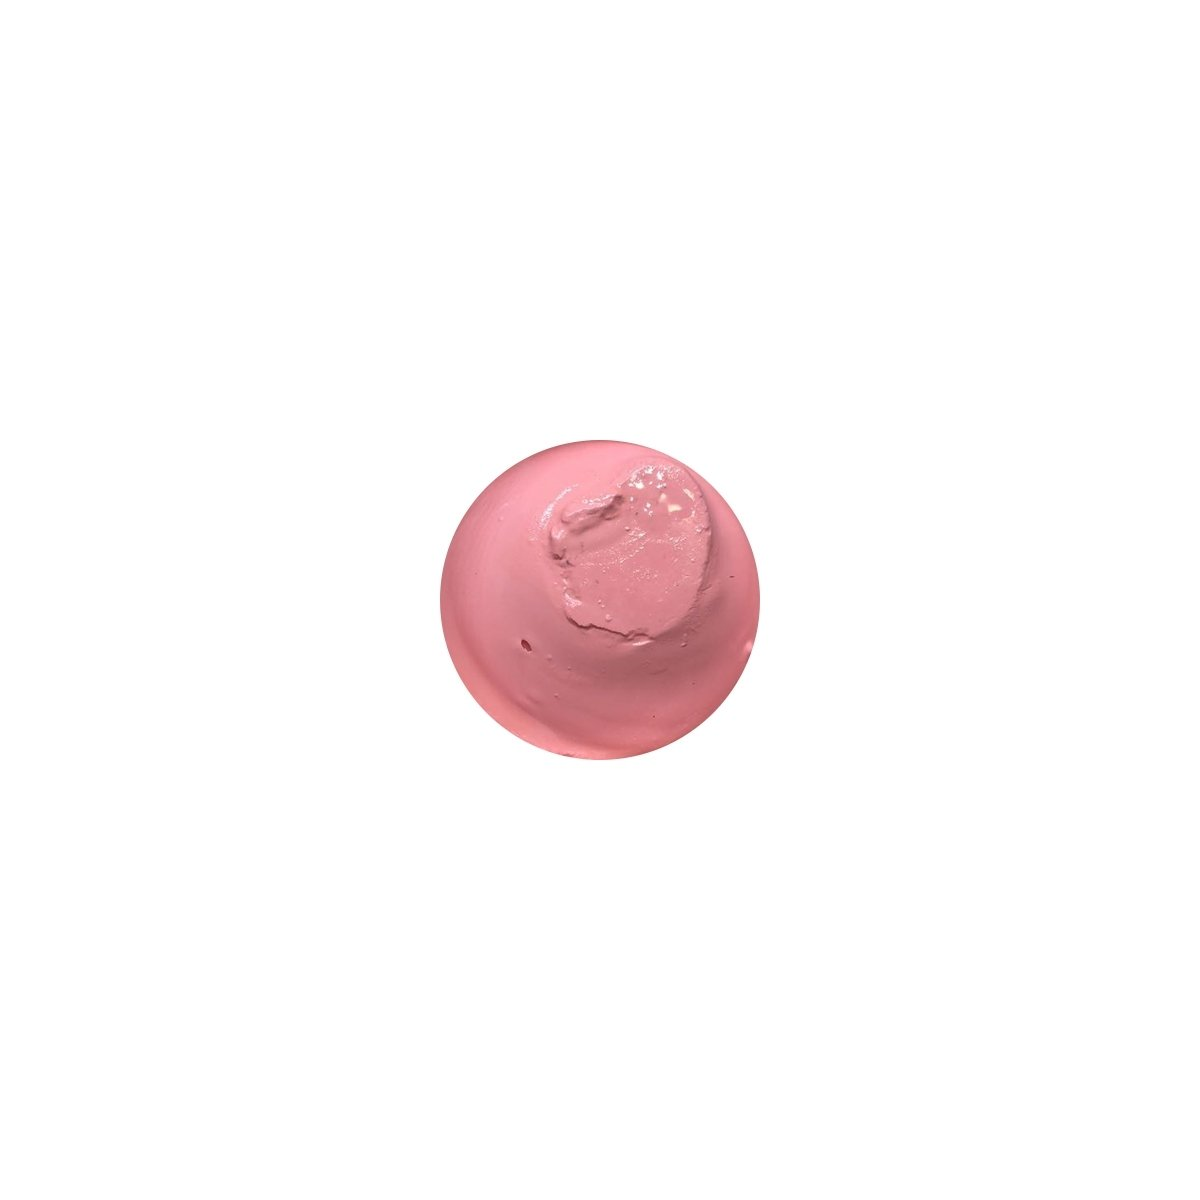 Tinta Genesis Pyrrole Red 07 - 4 gramas ou 8 gramas